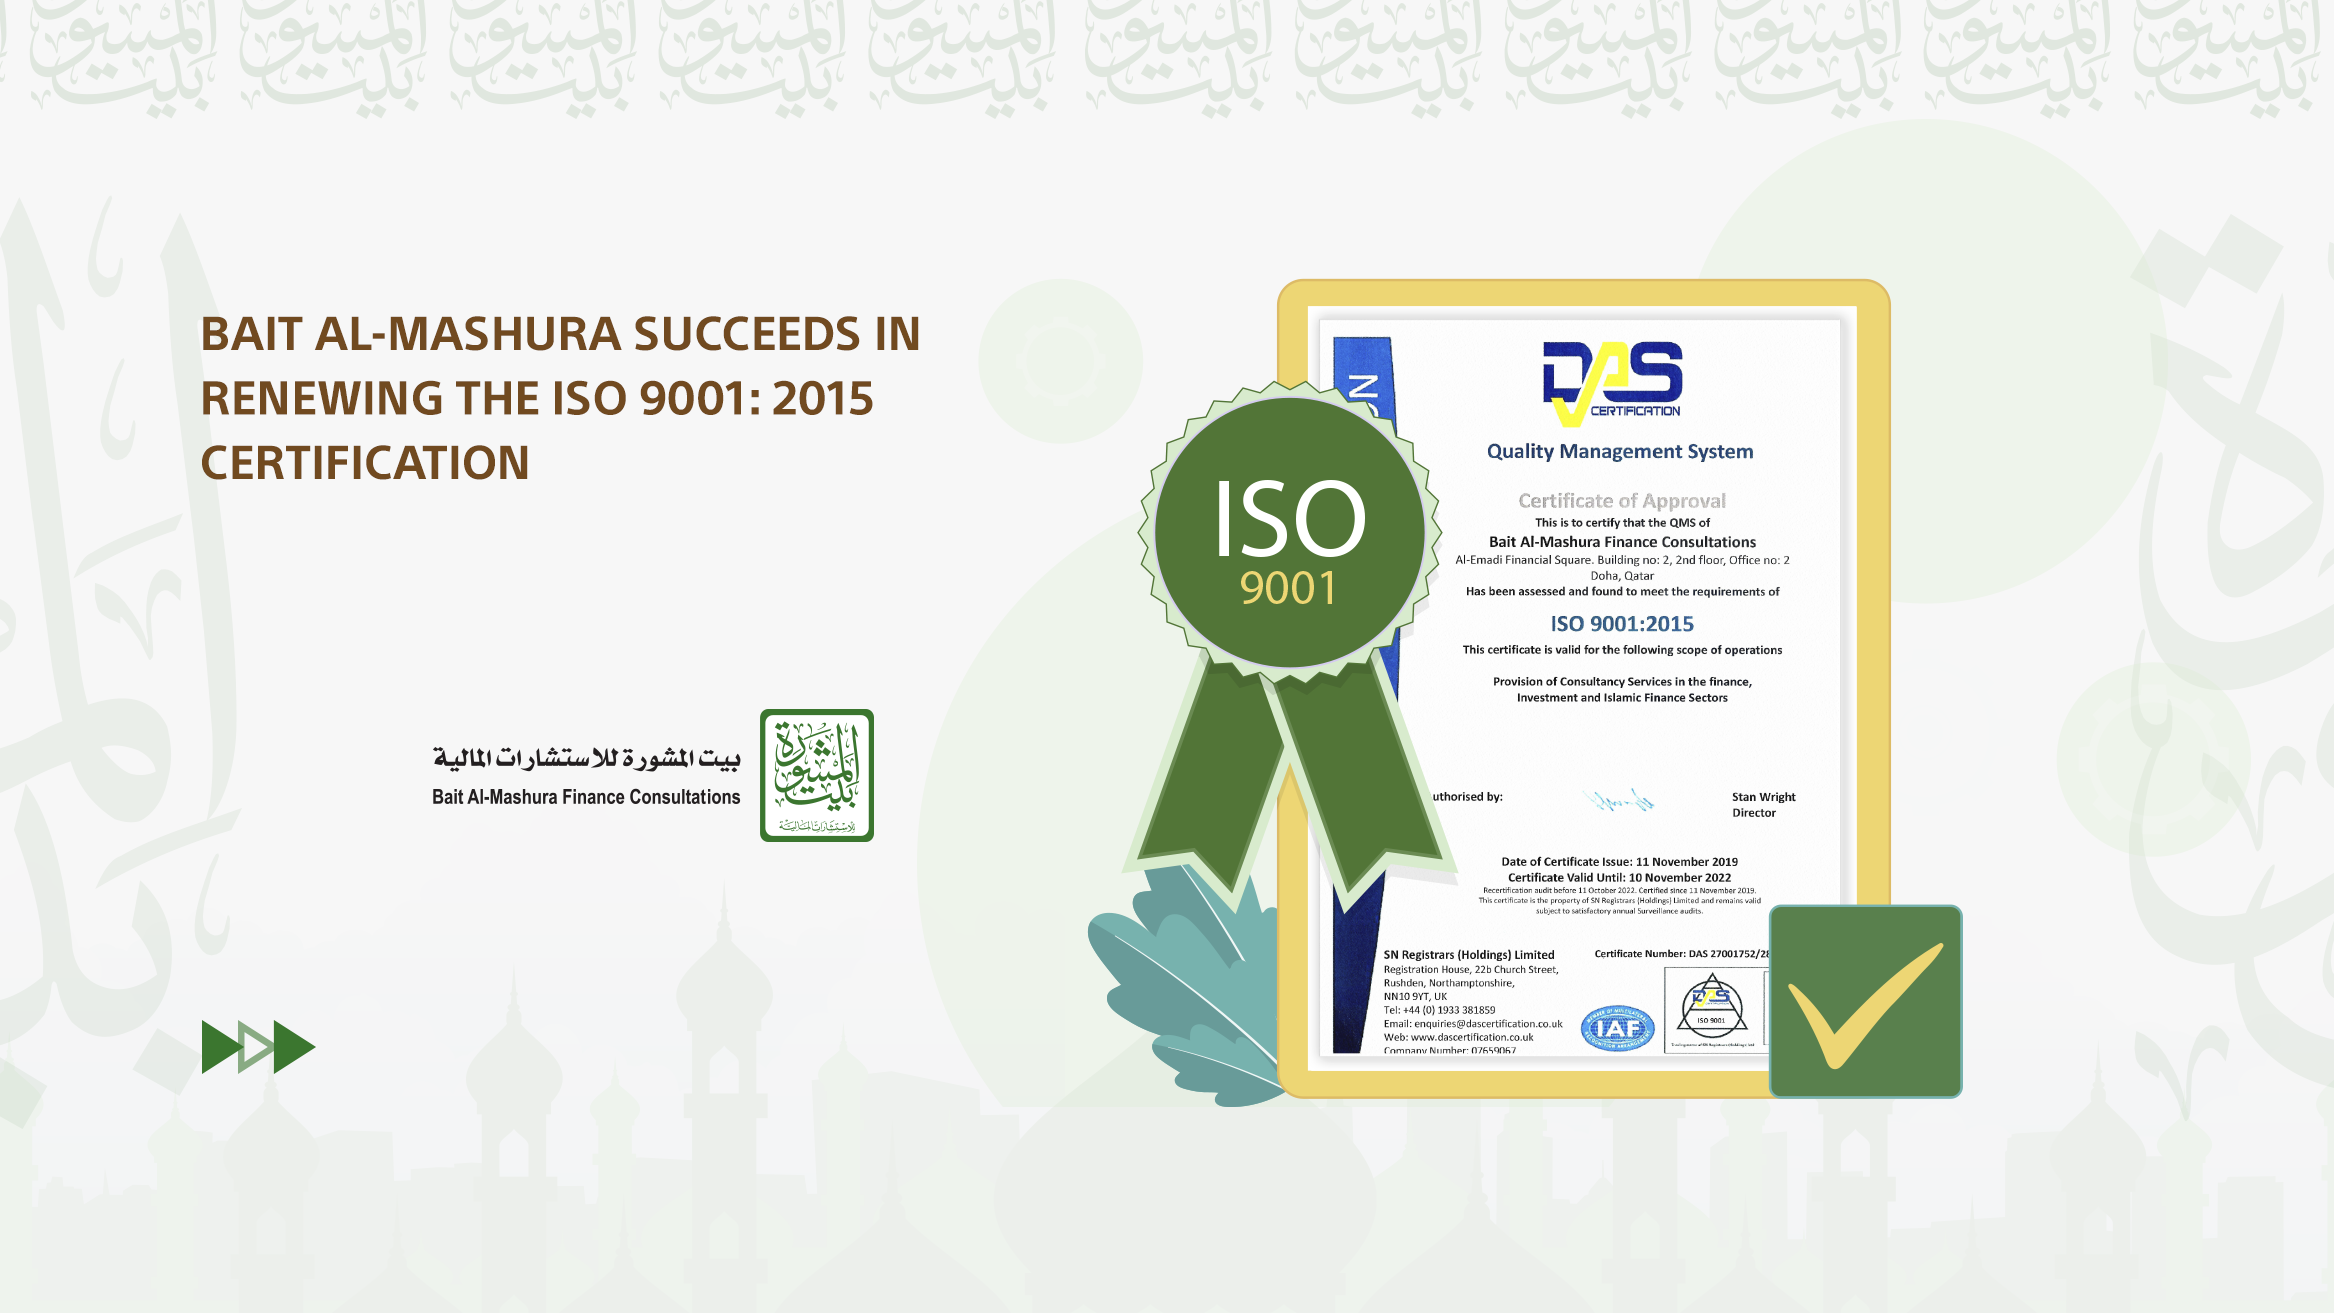 Bait Al-Mashura succeeds in renewing the ISO 9001: 2015 certification